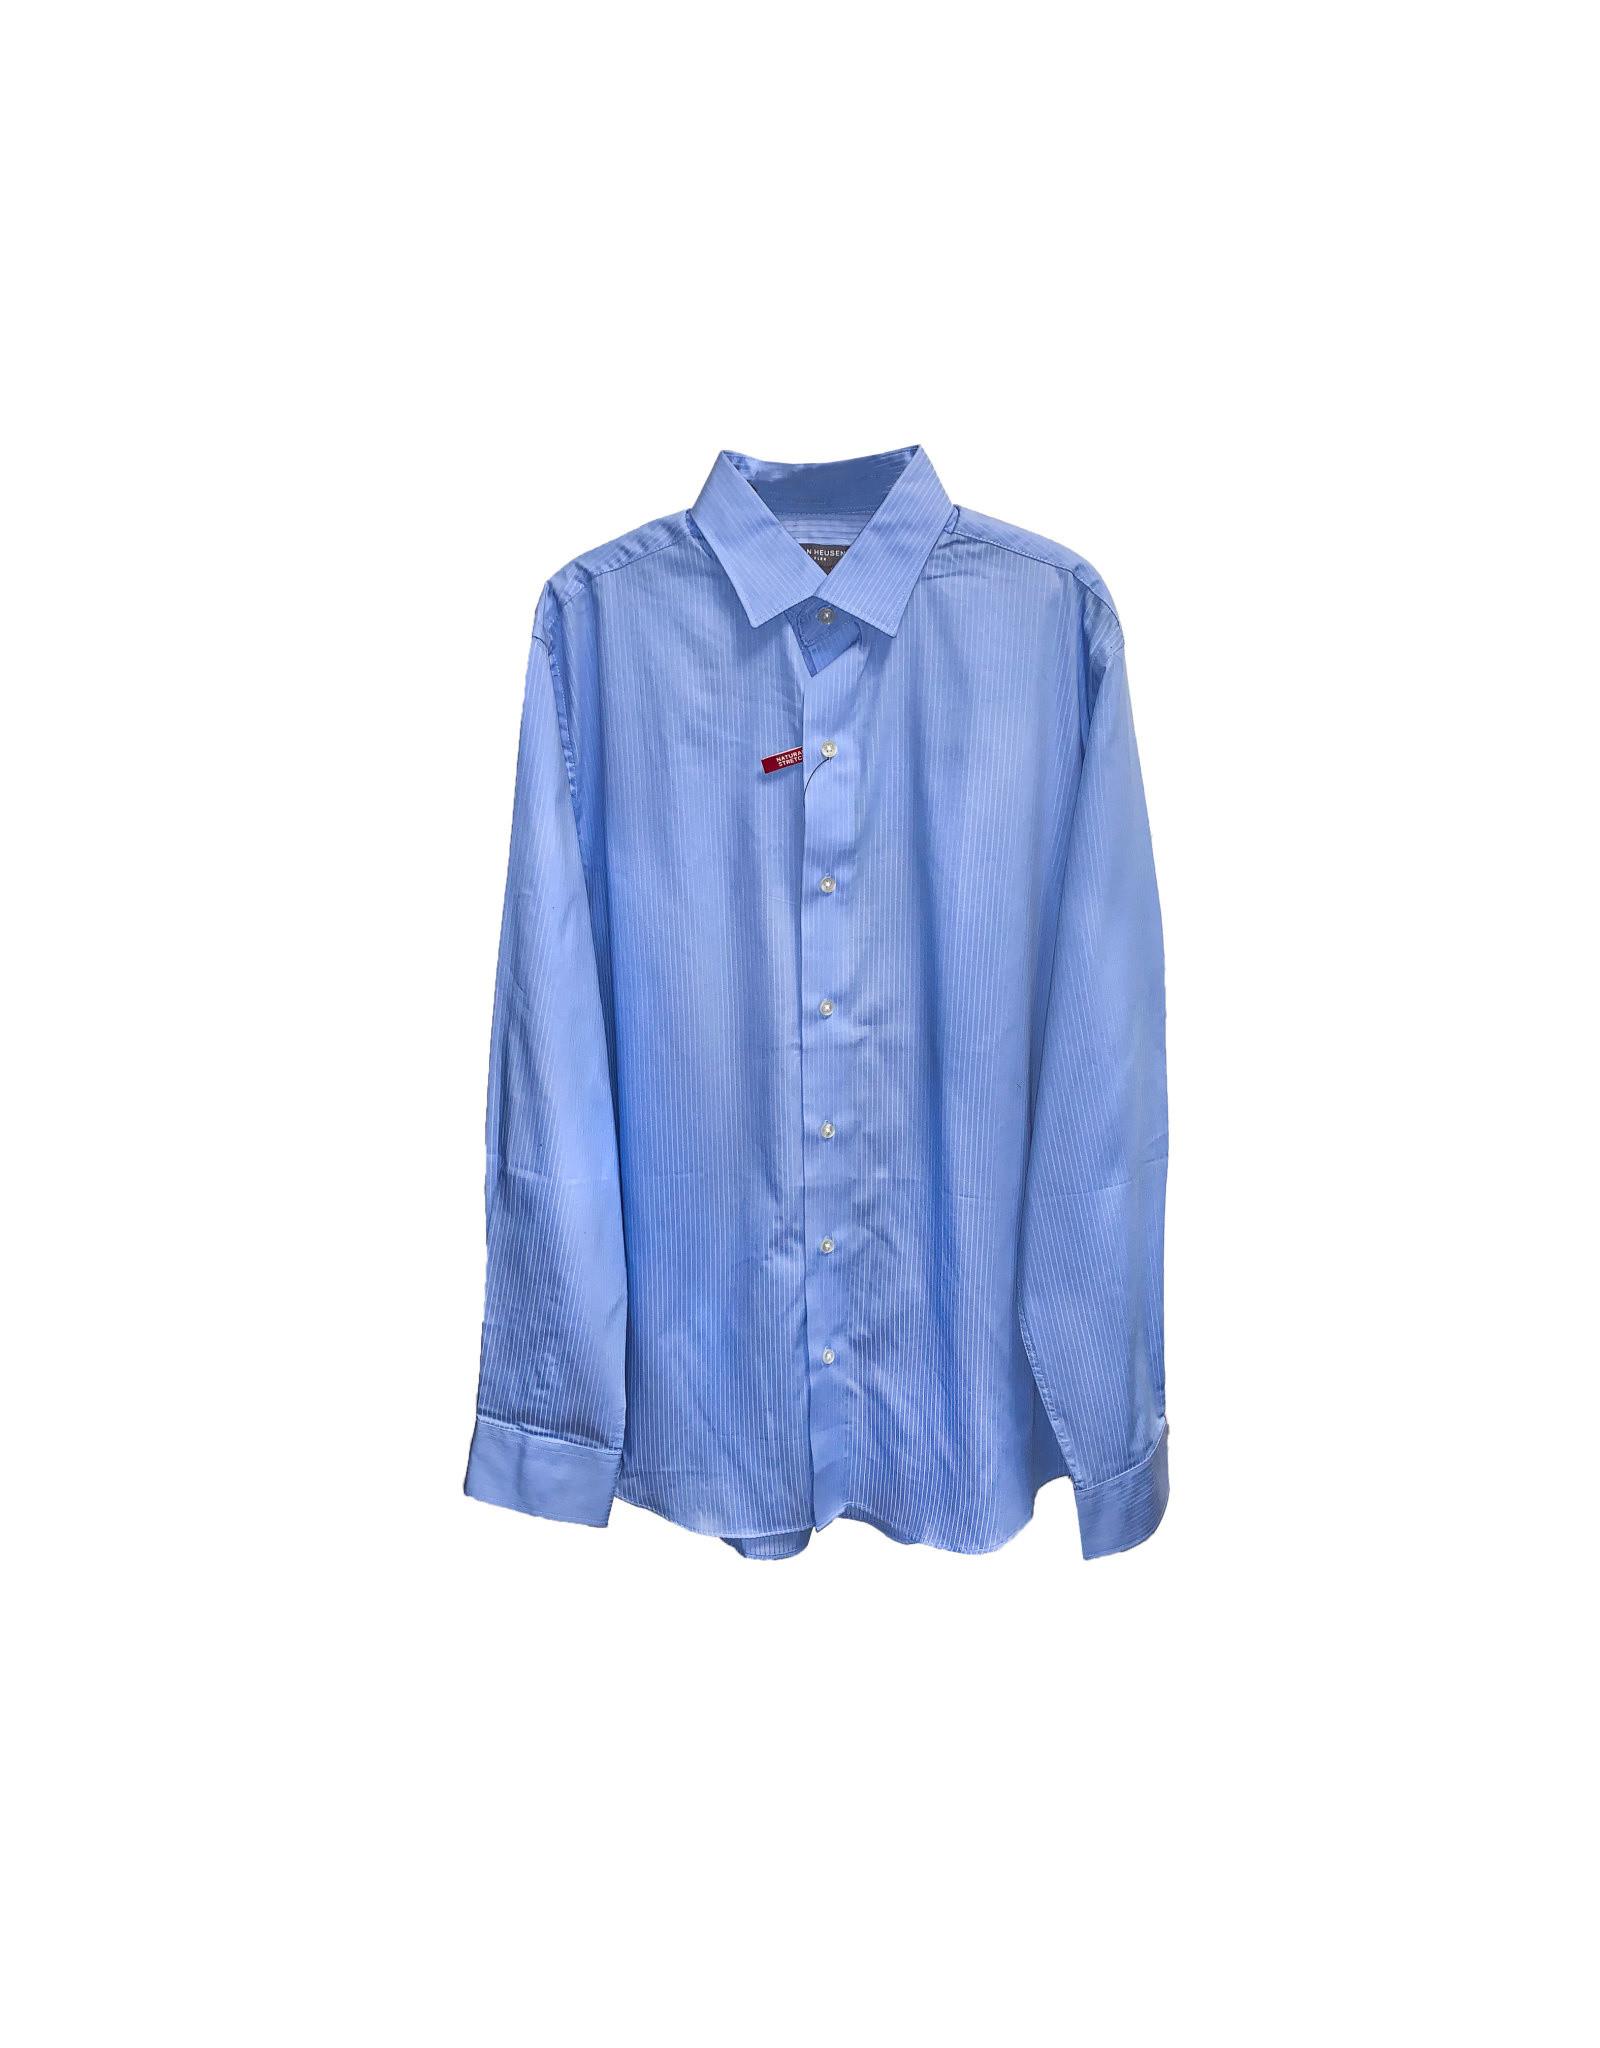 Van Heusen VAN HEUSEN  Classic  Fit Flex Shirt  SizeM